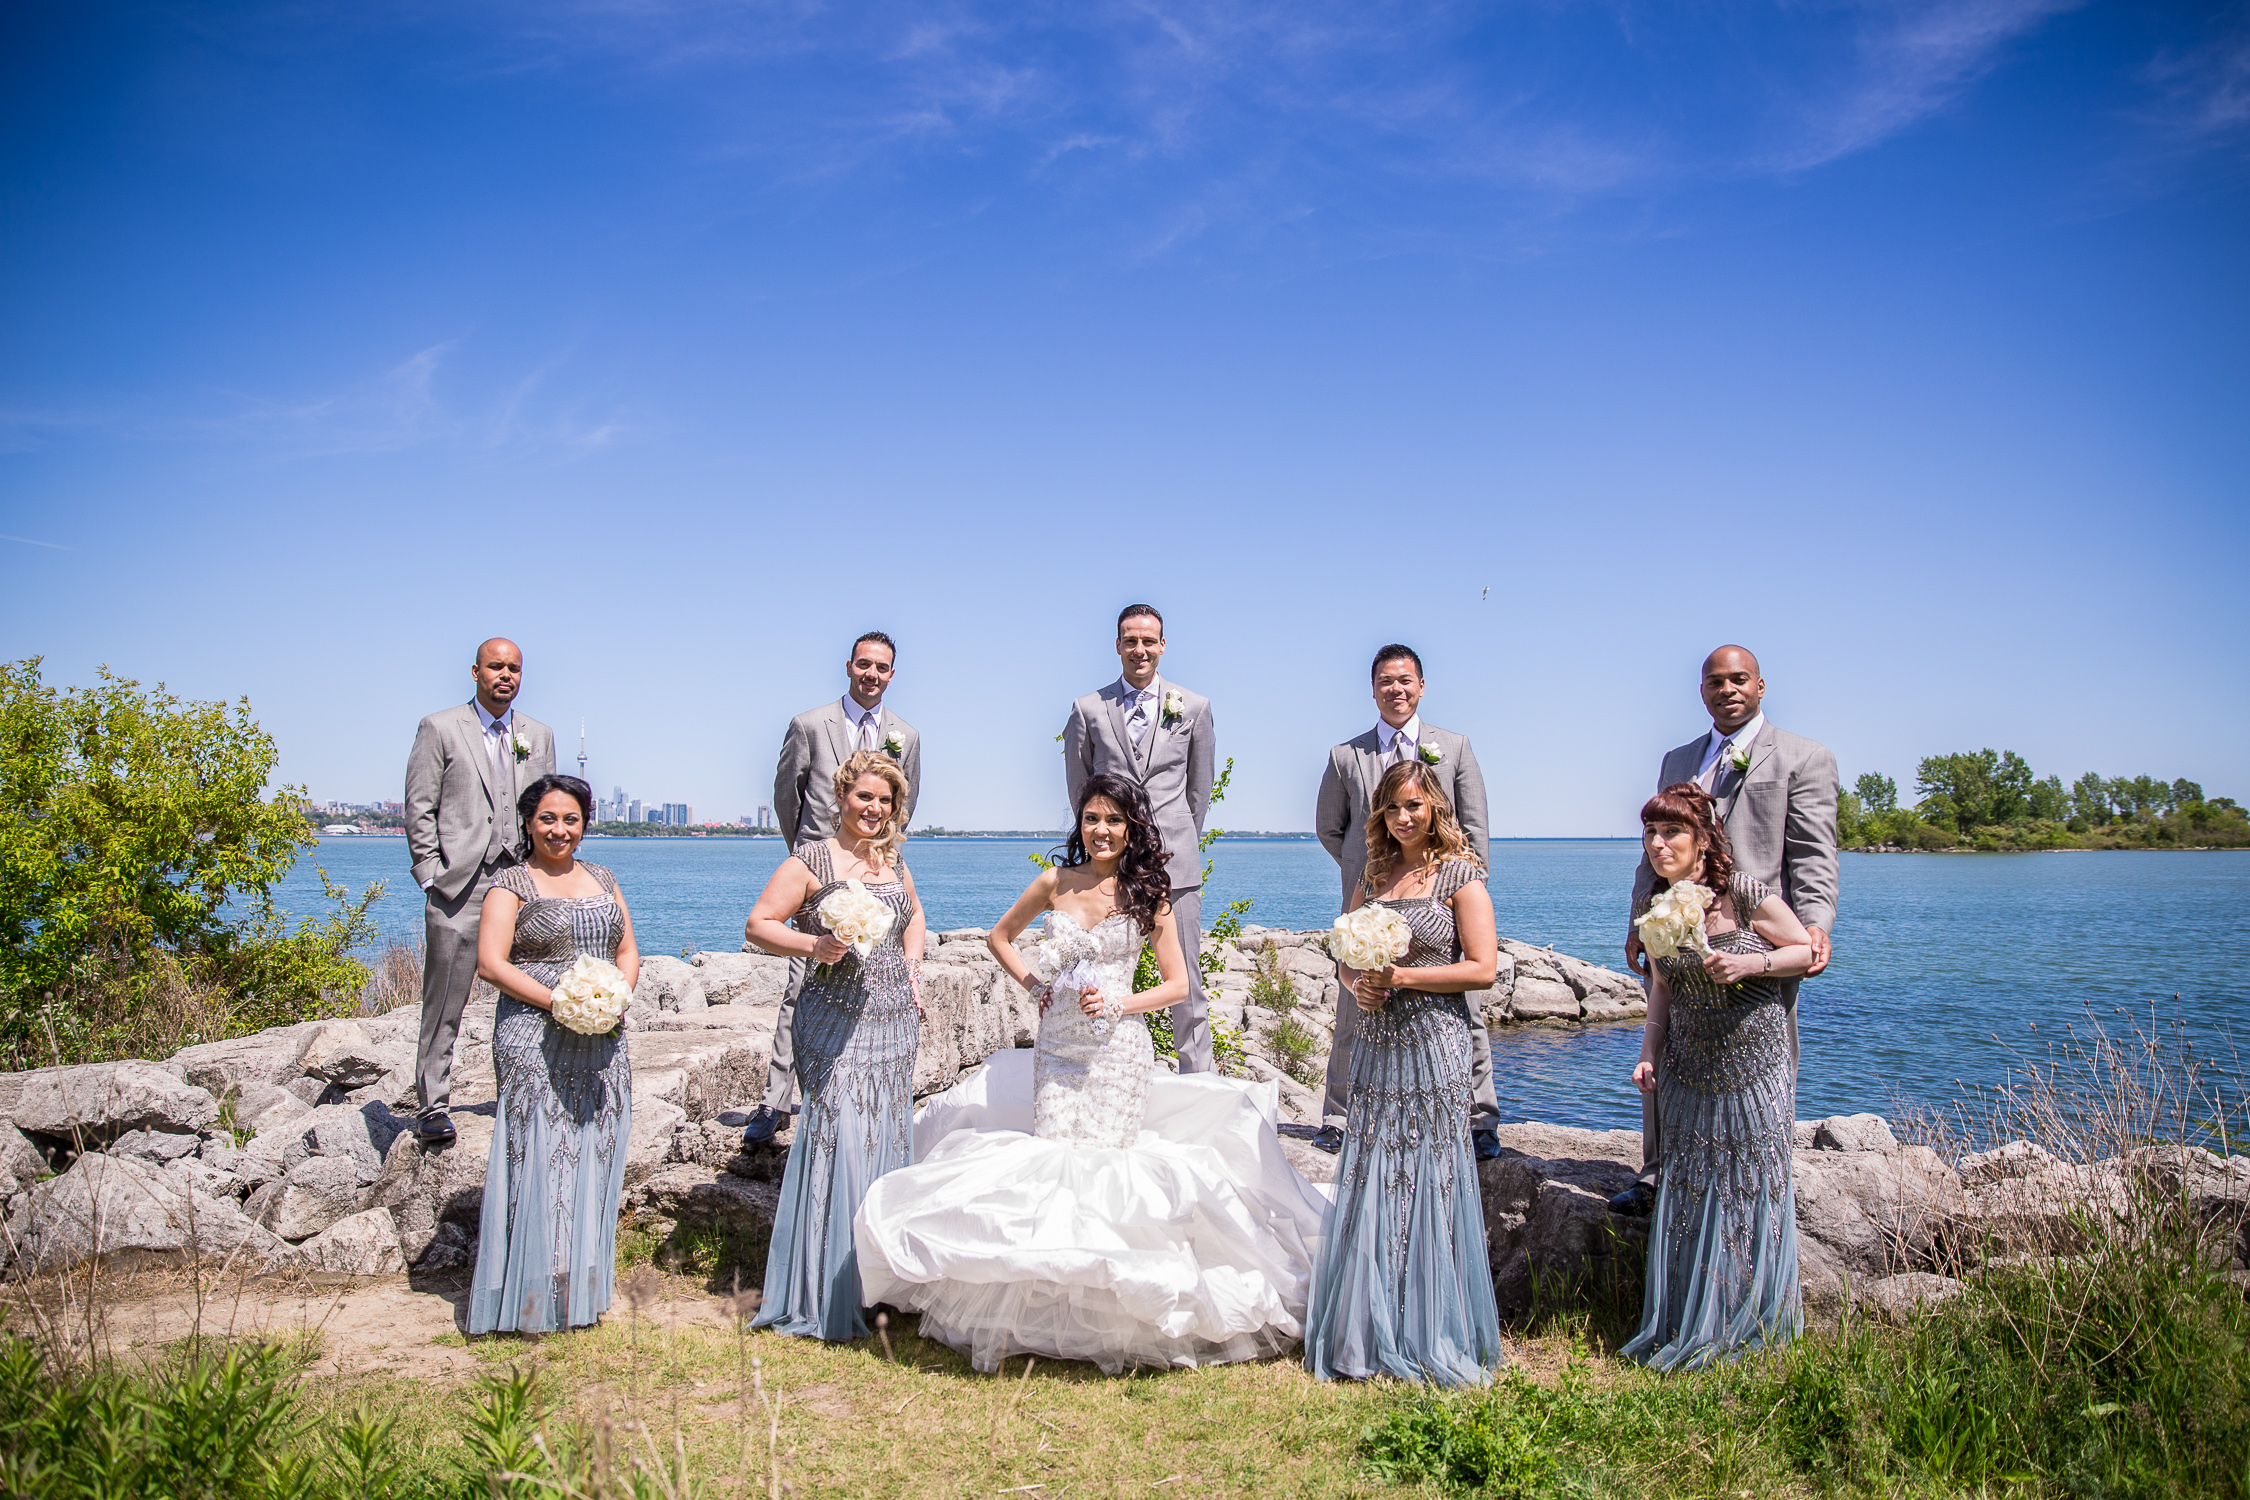 Paradise-Banquet-Hall-Wedding-Vaughan-Ontario-0061.jpg